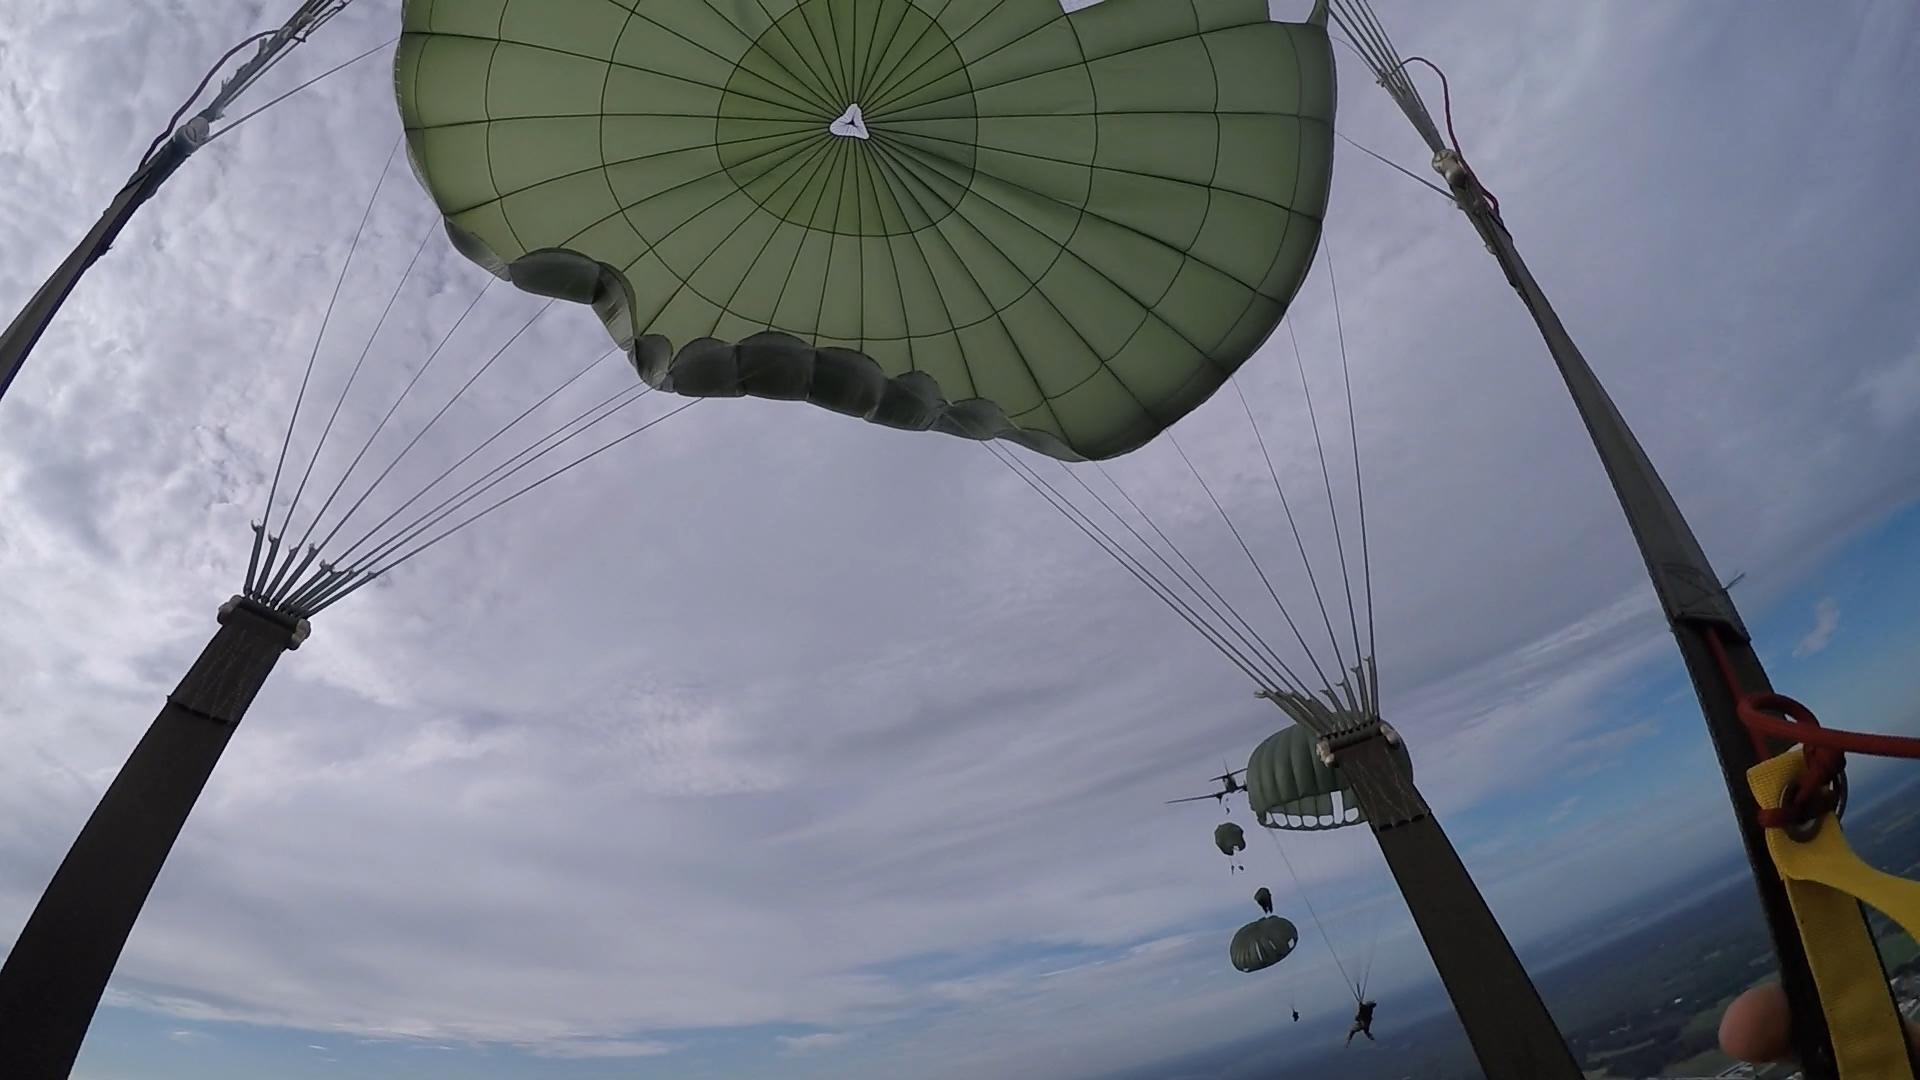 Airborne 15aug15 - 4 - canopy.jpg